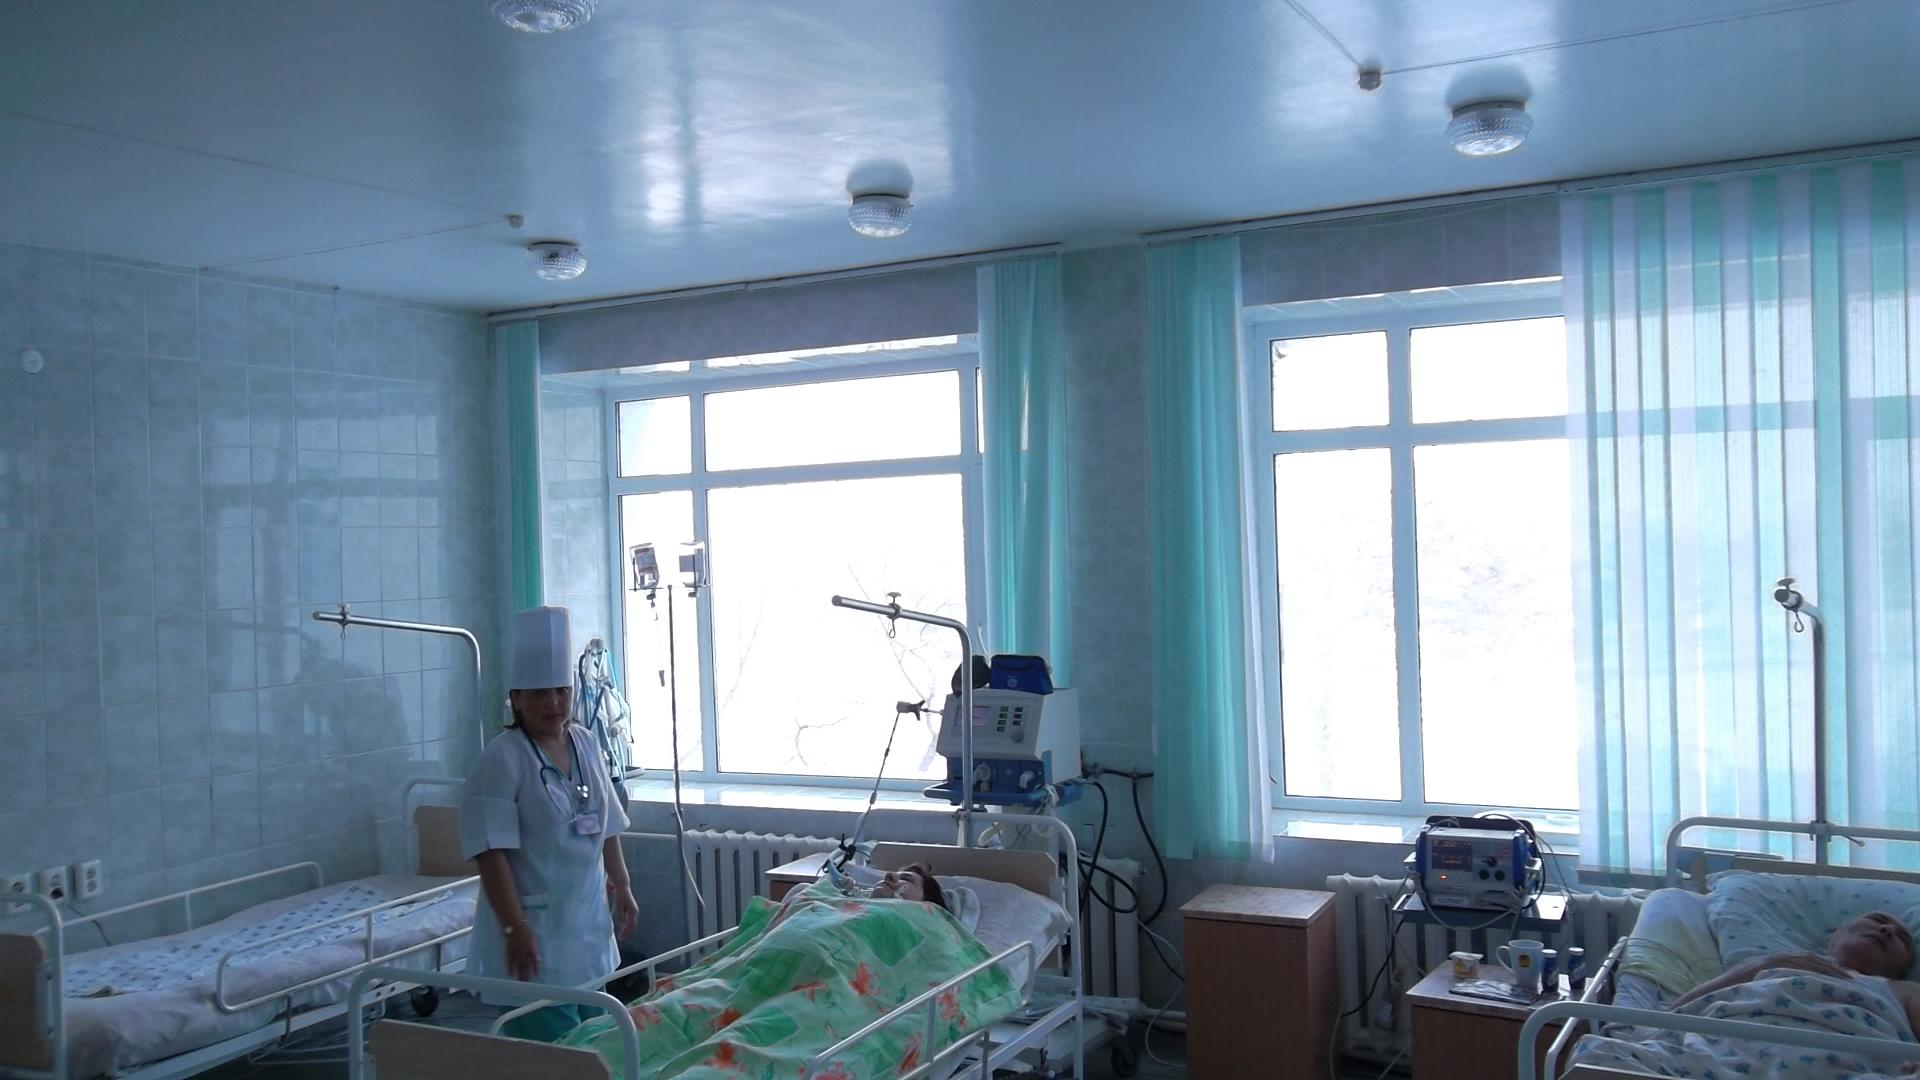 Запись к врачу краснодар поликлиника 11 пашковка краснодар